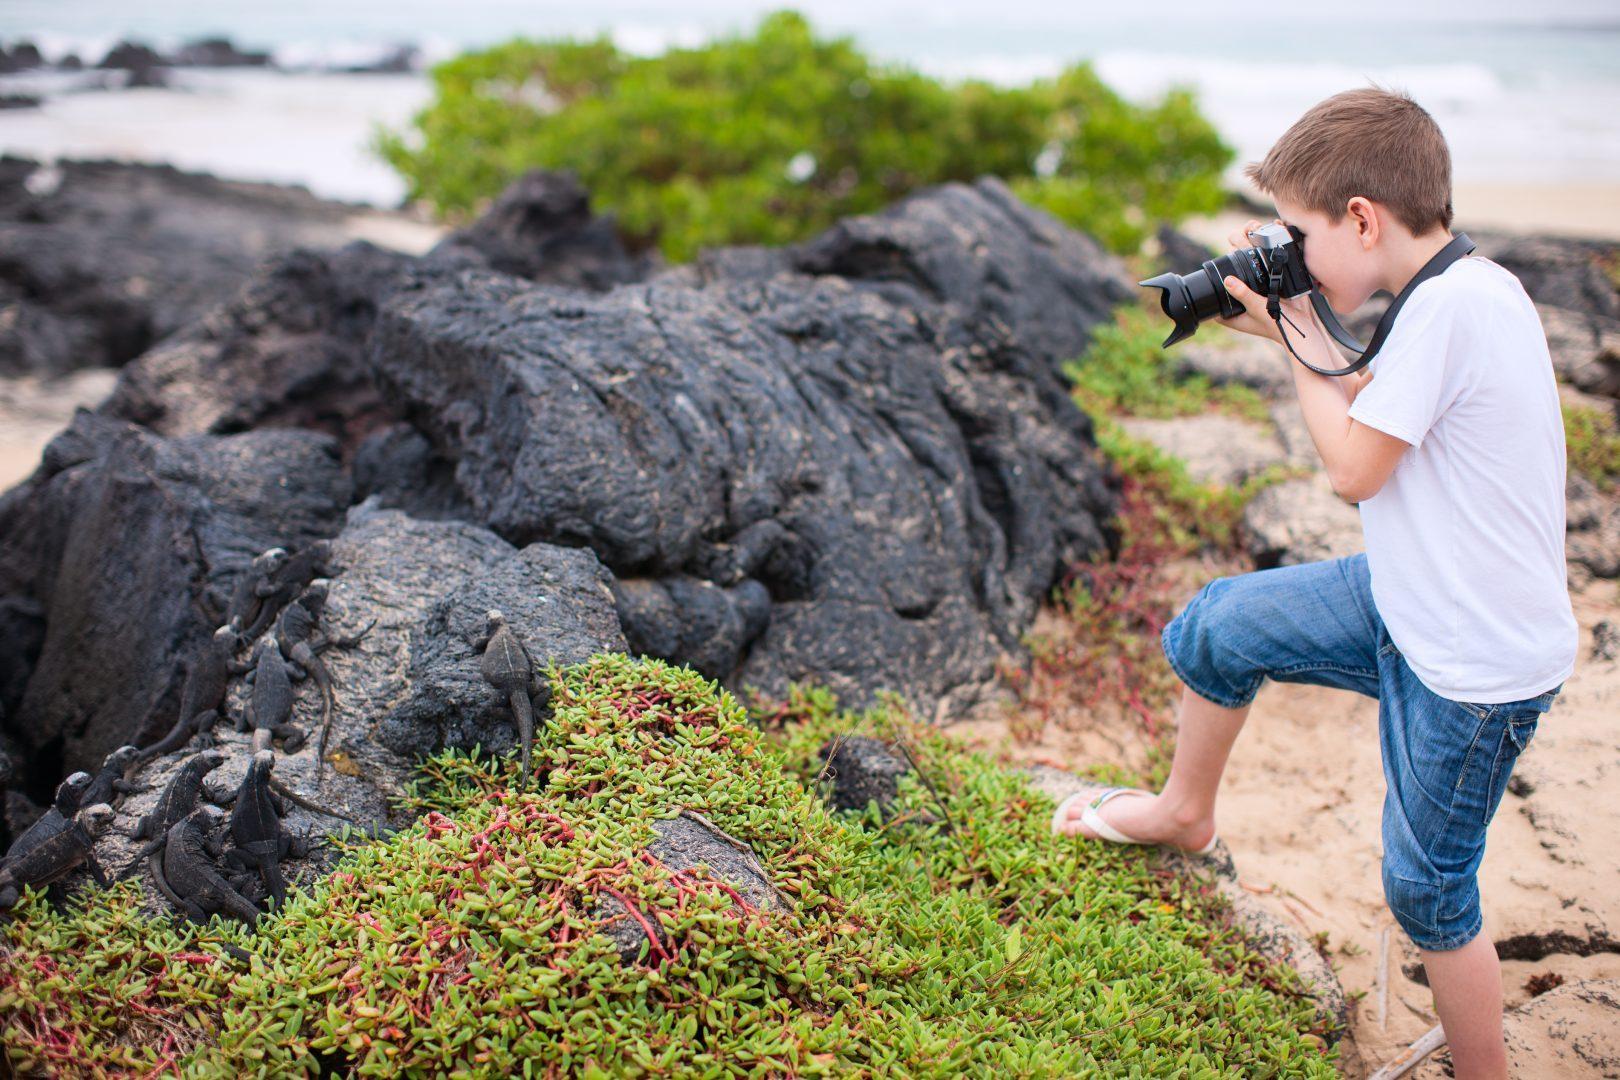 Photographing iguana in Galapagos